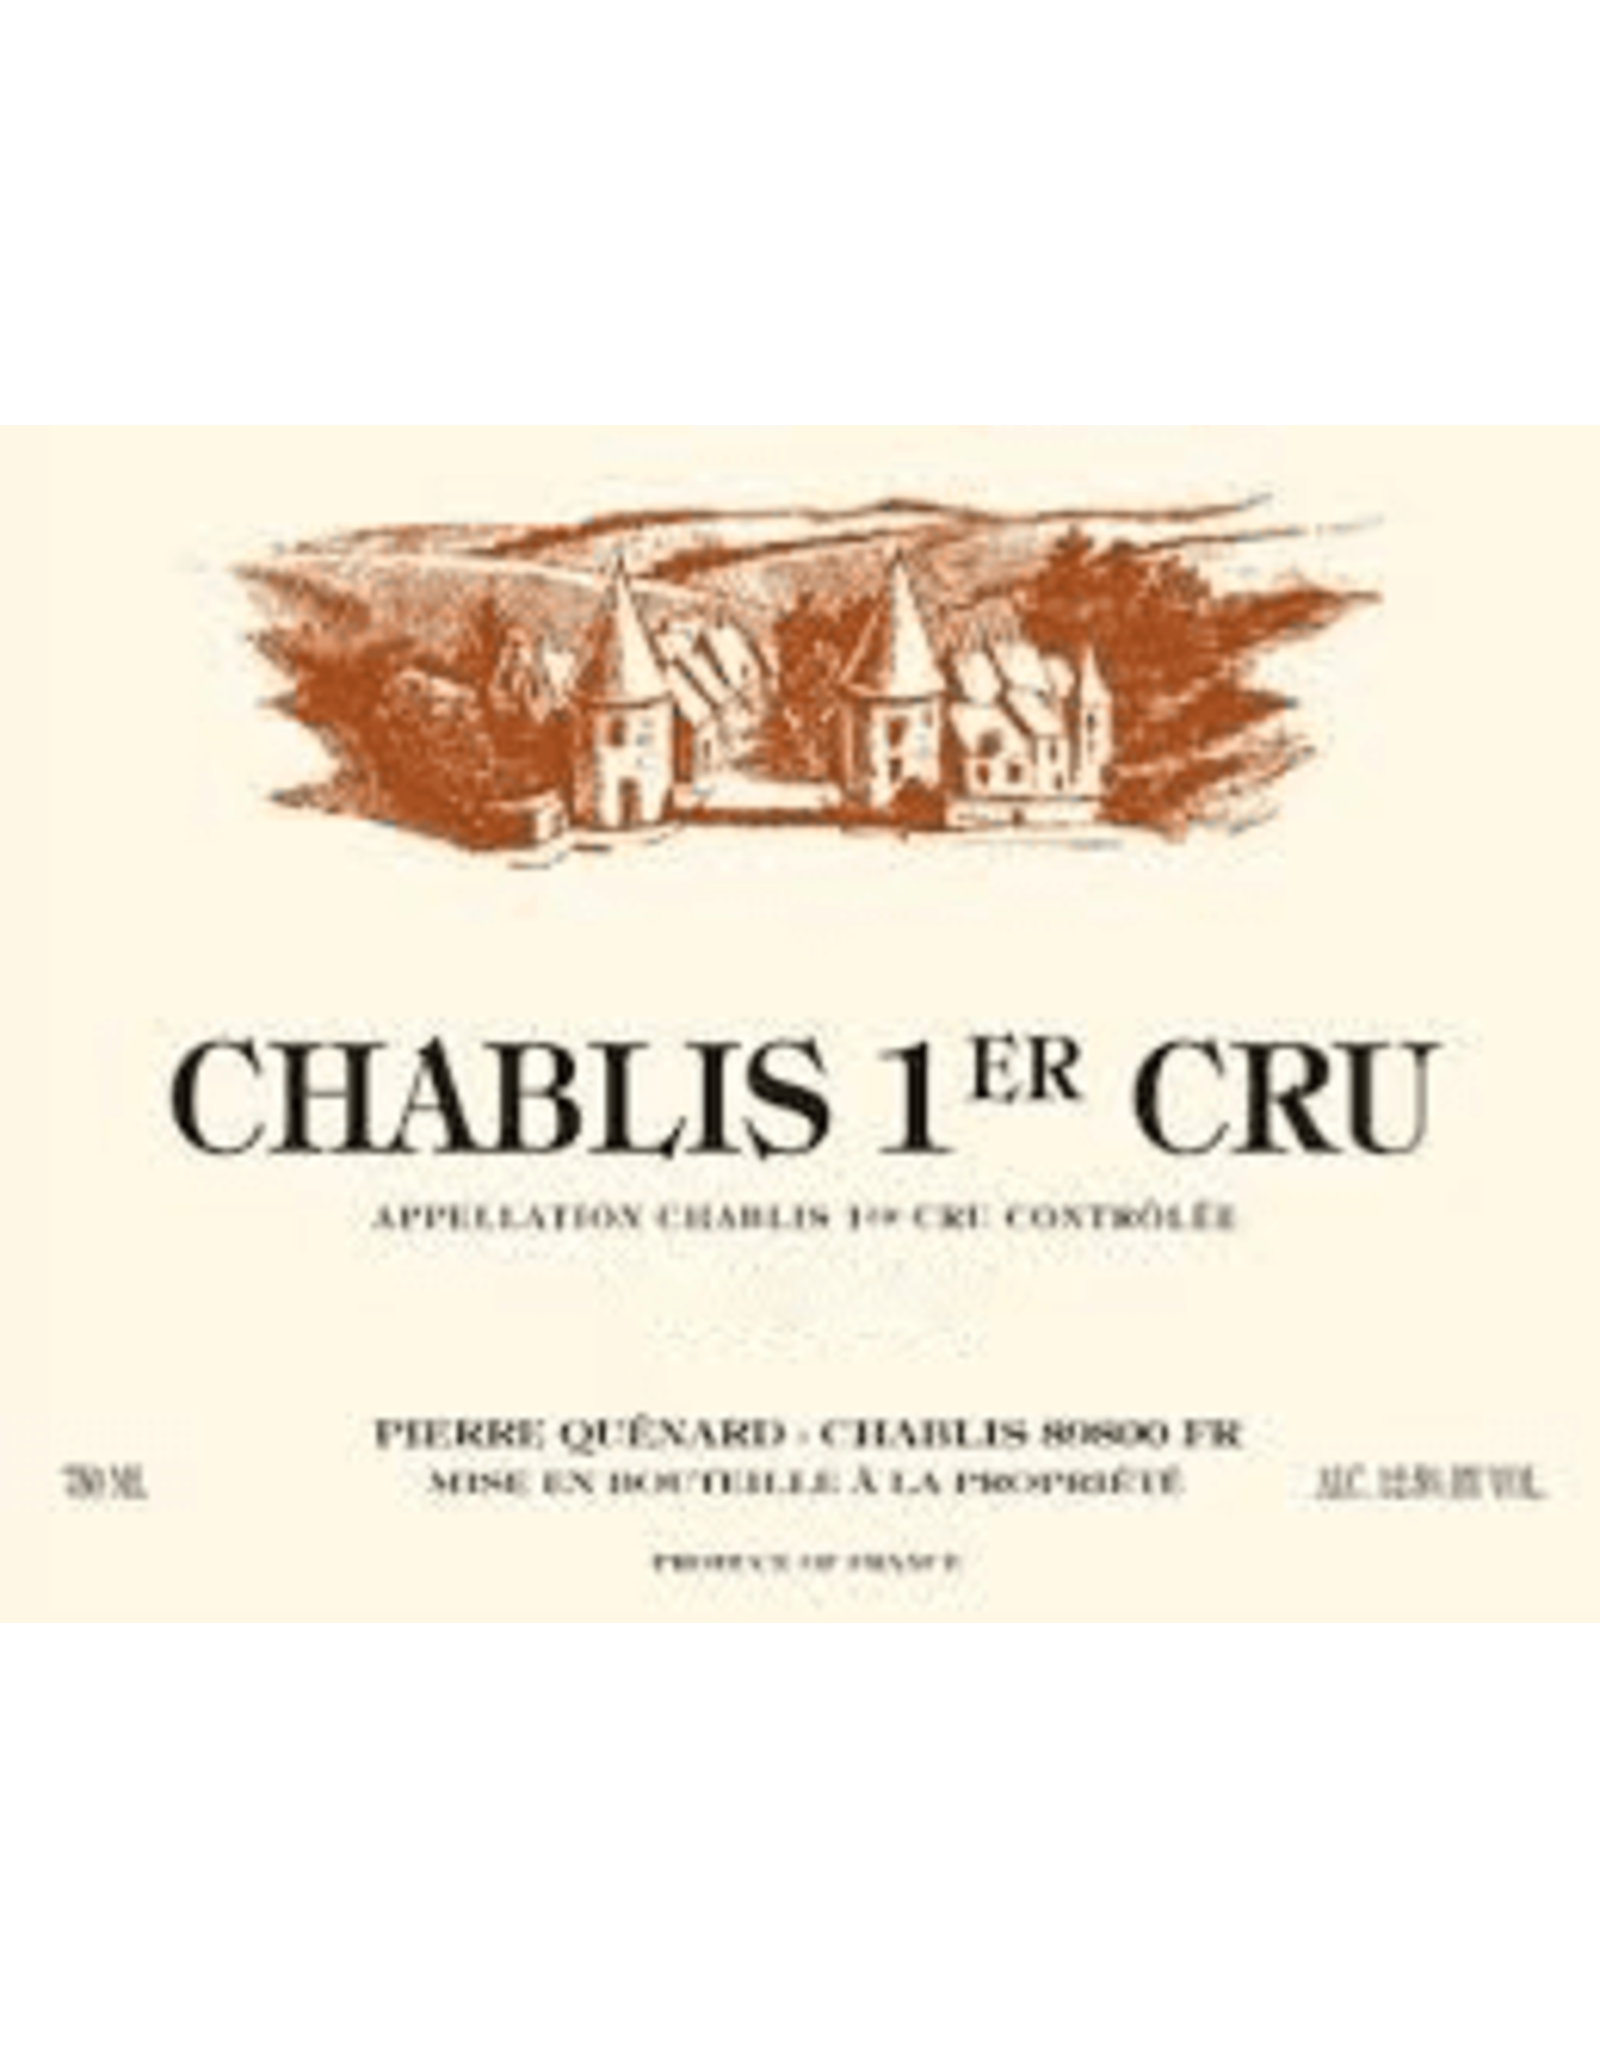 Pierre Quenard Chablis 1er Cru 2019